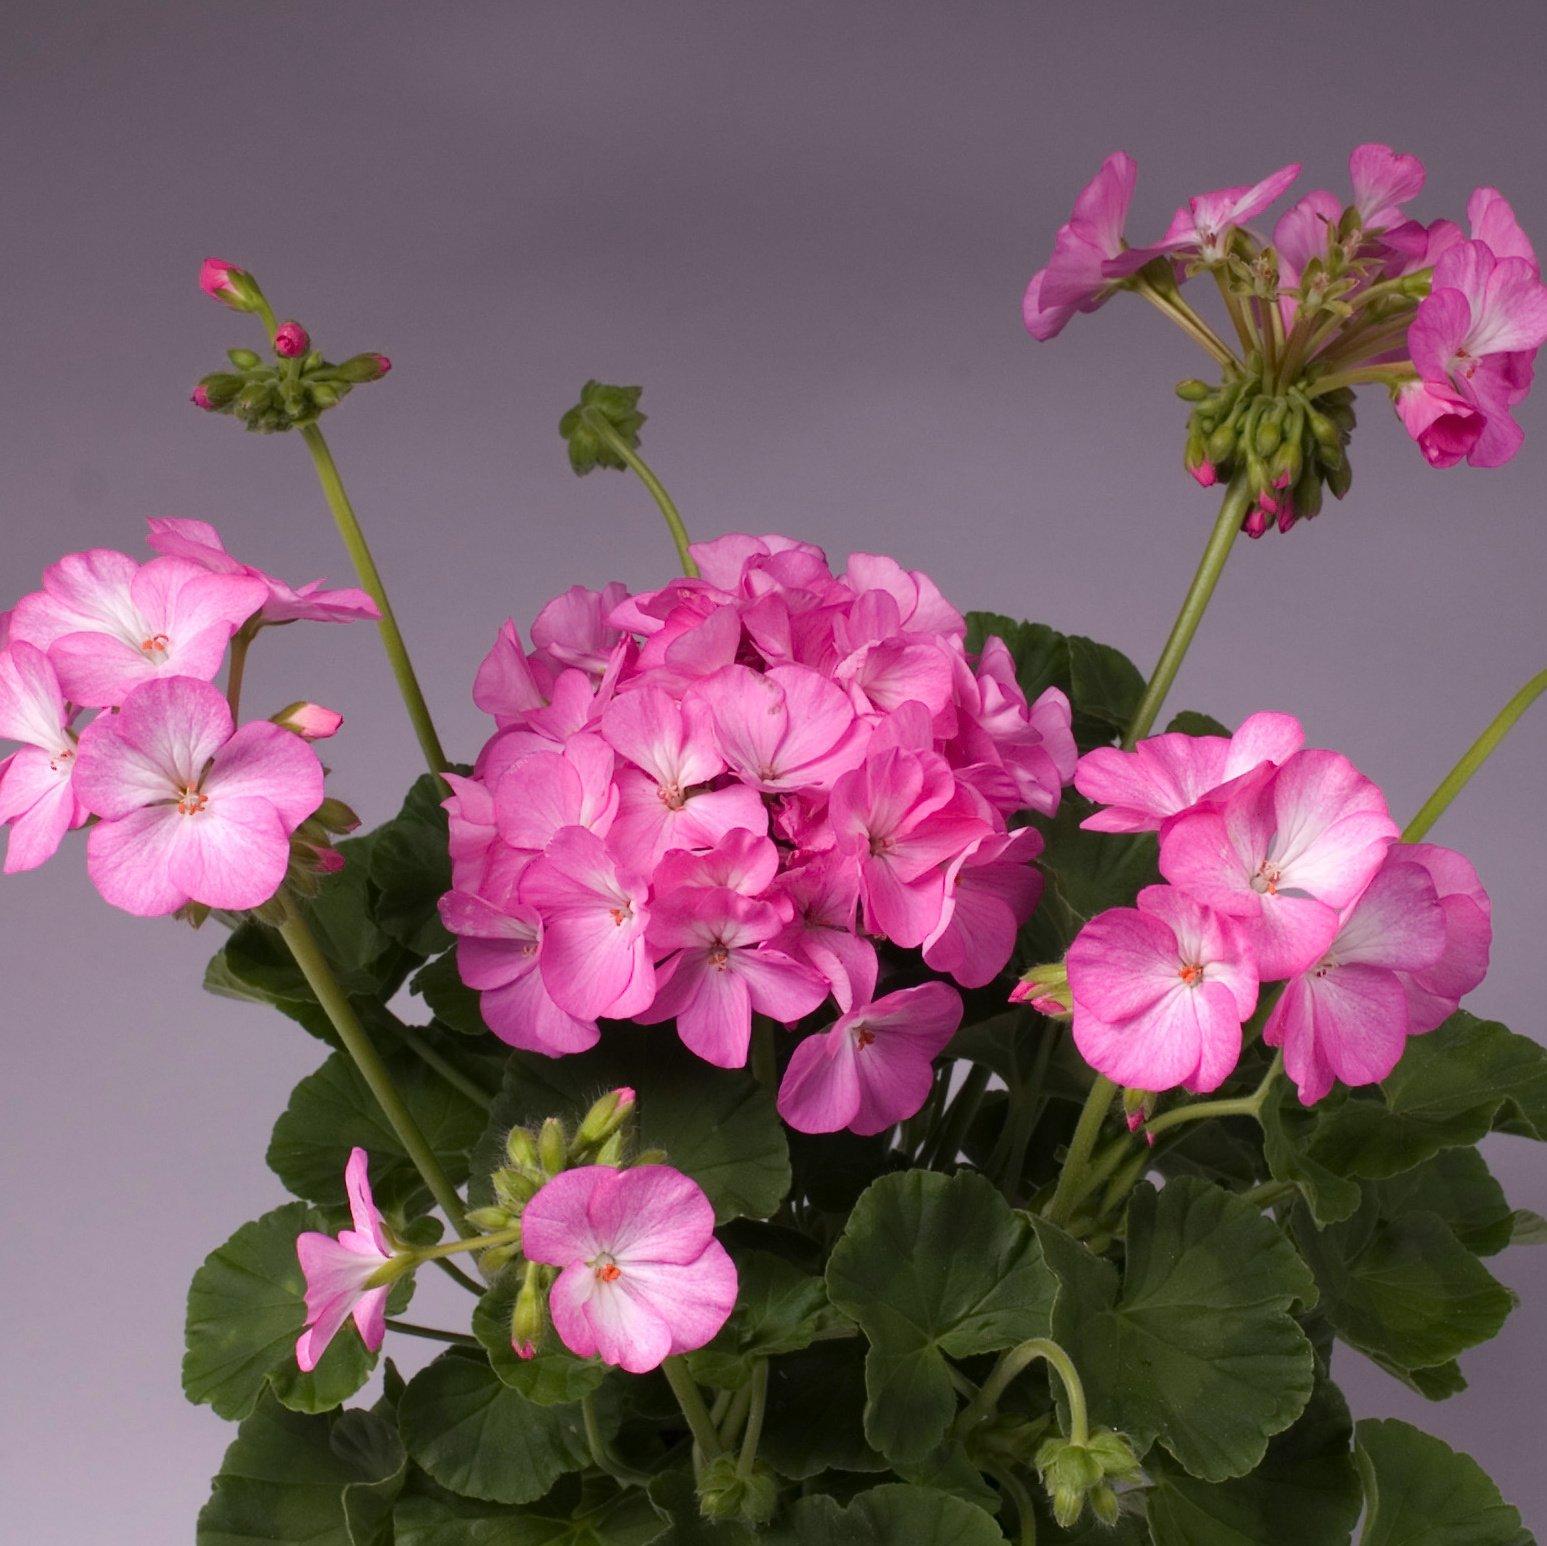 Geranium Nano pink bicolor